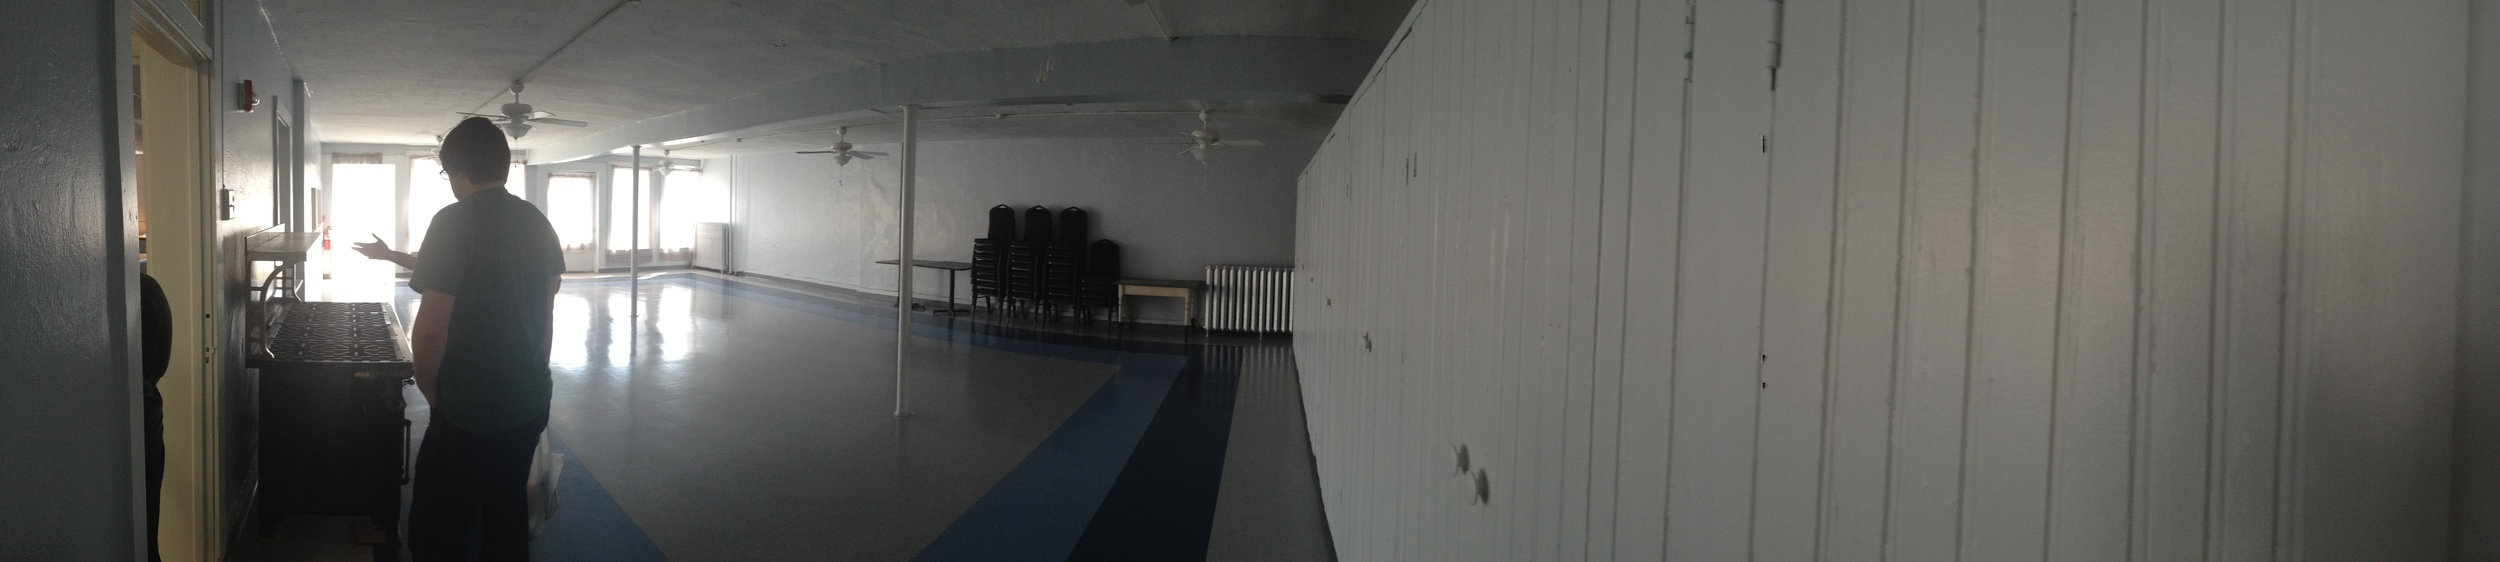 empty room next to kitchen